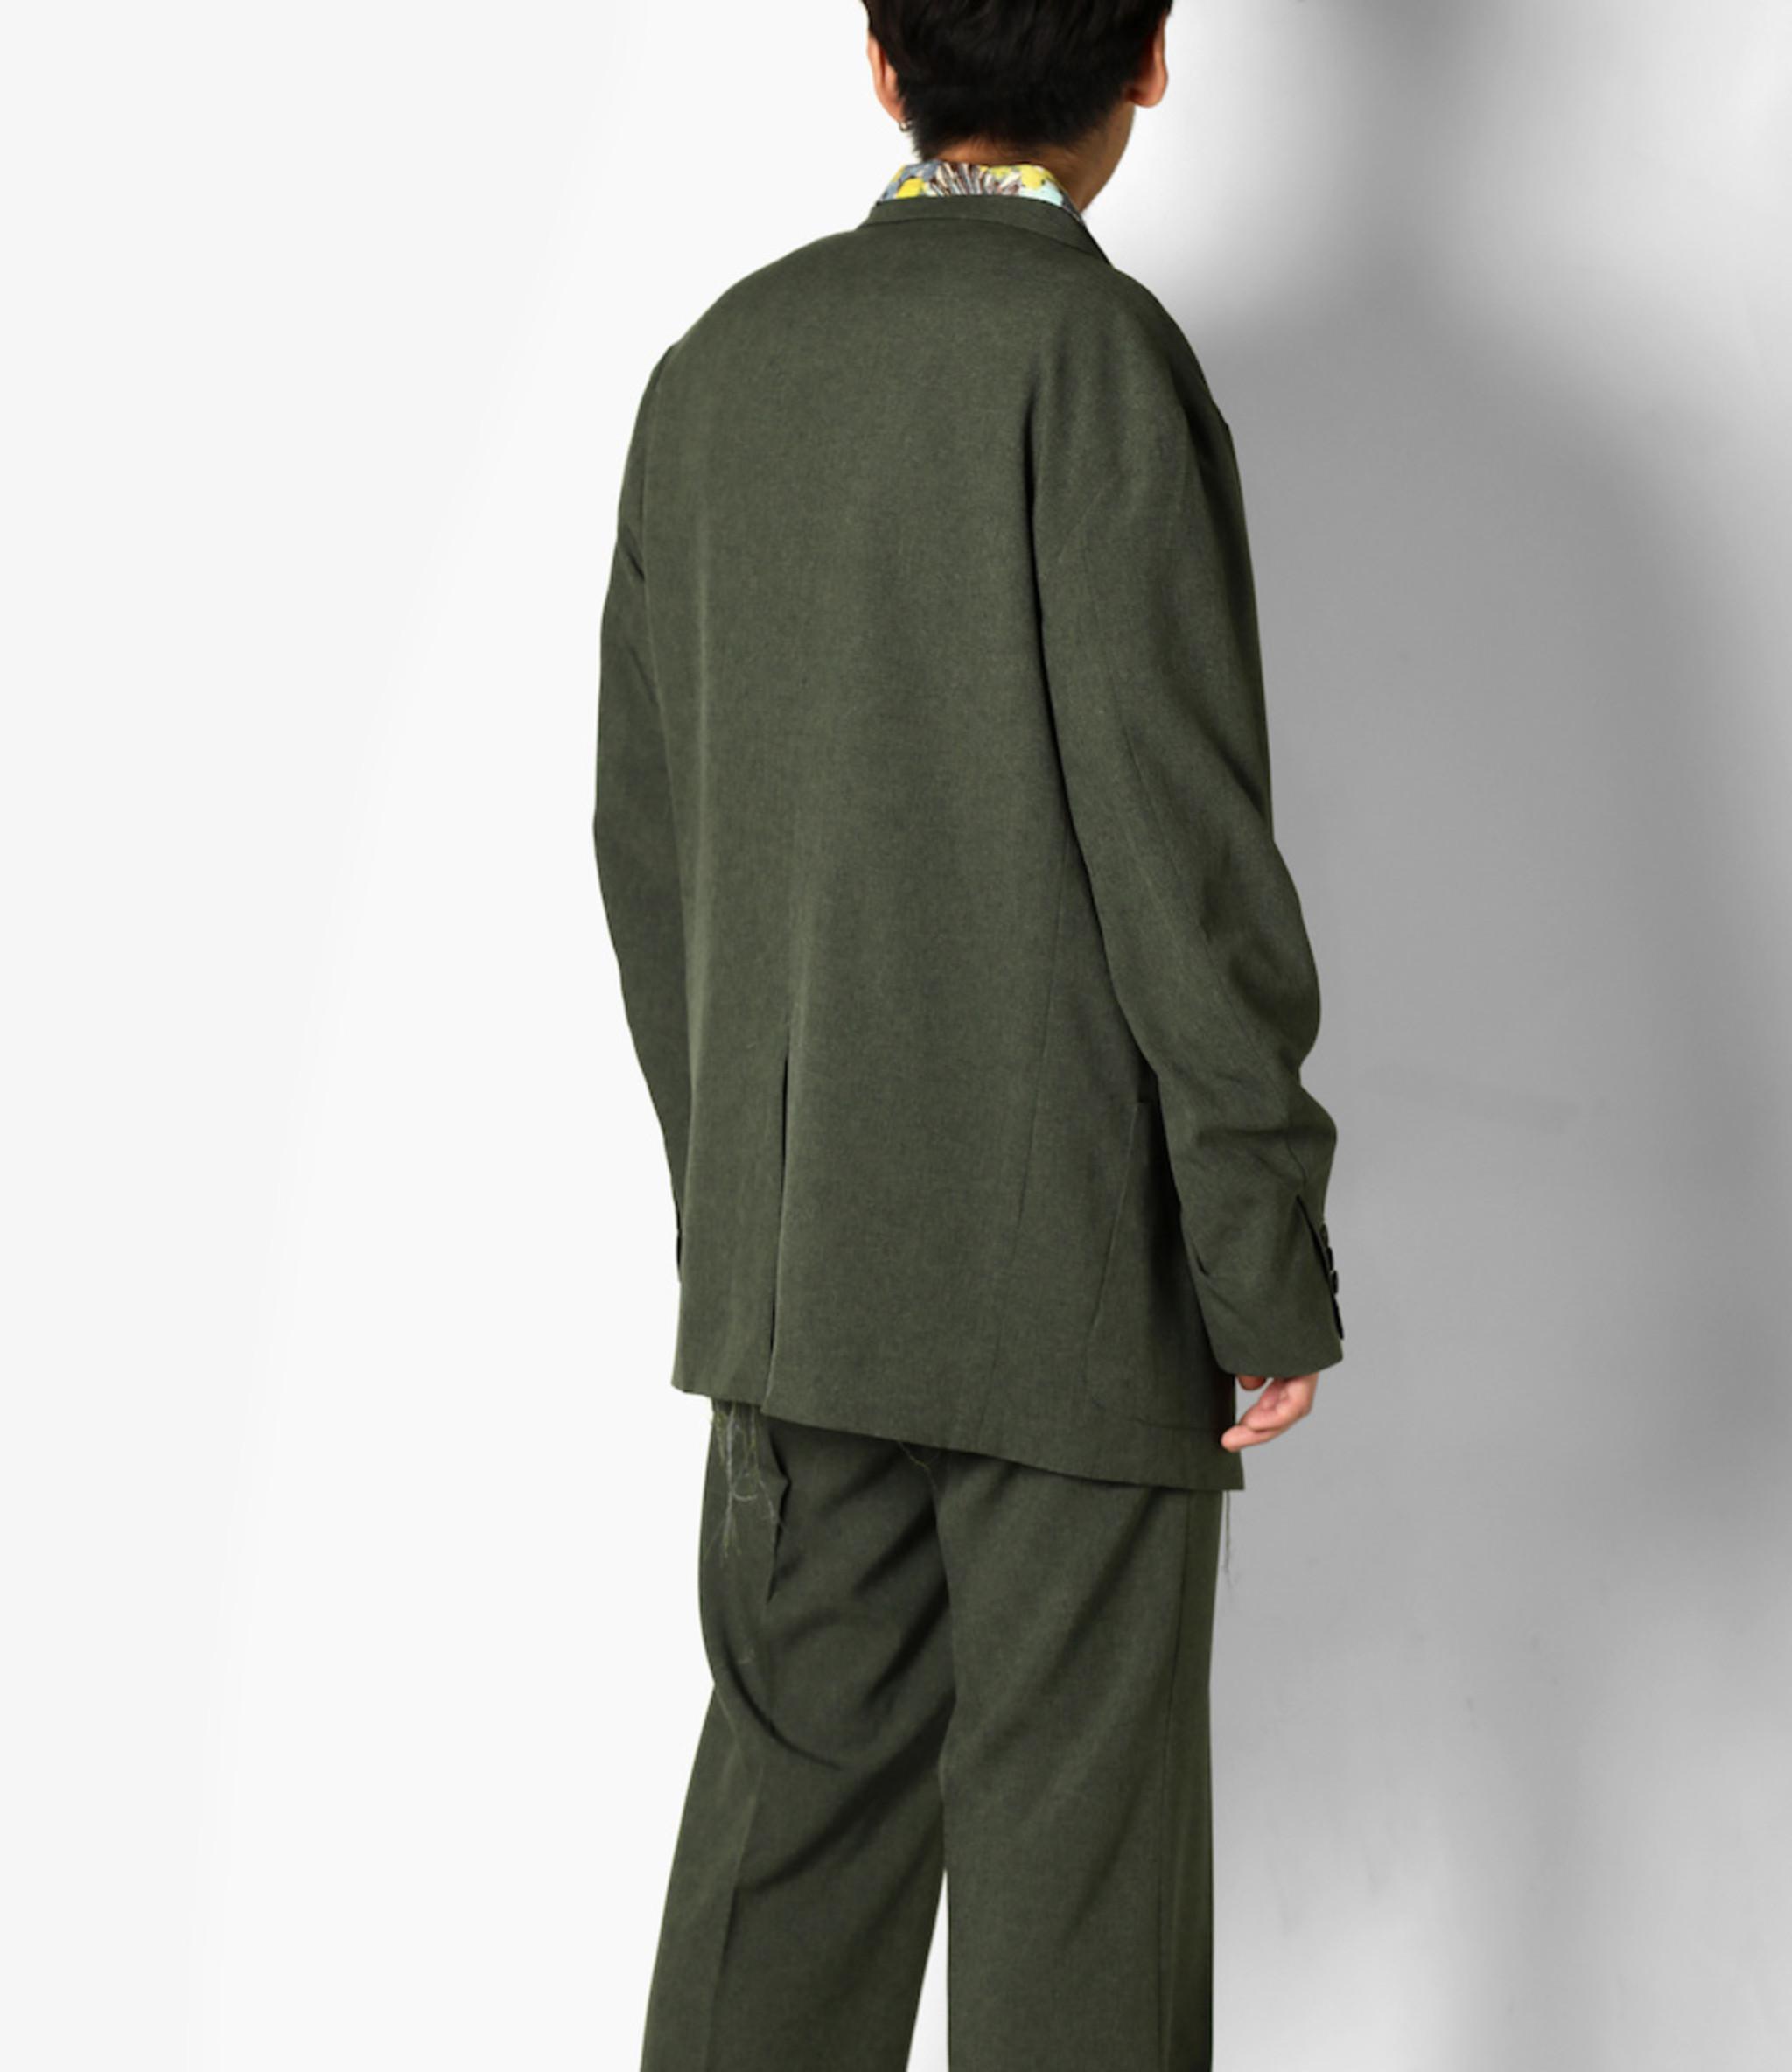 Needles Peaked Lapel 1B Jacket - Poly Chambray Cloth - Green